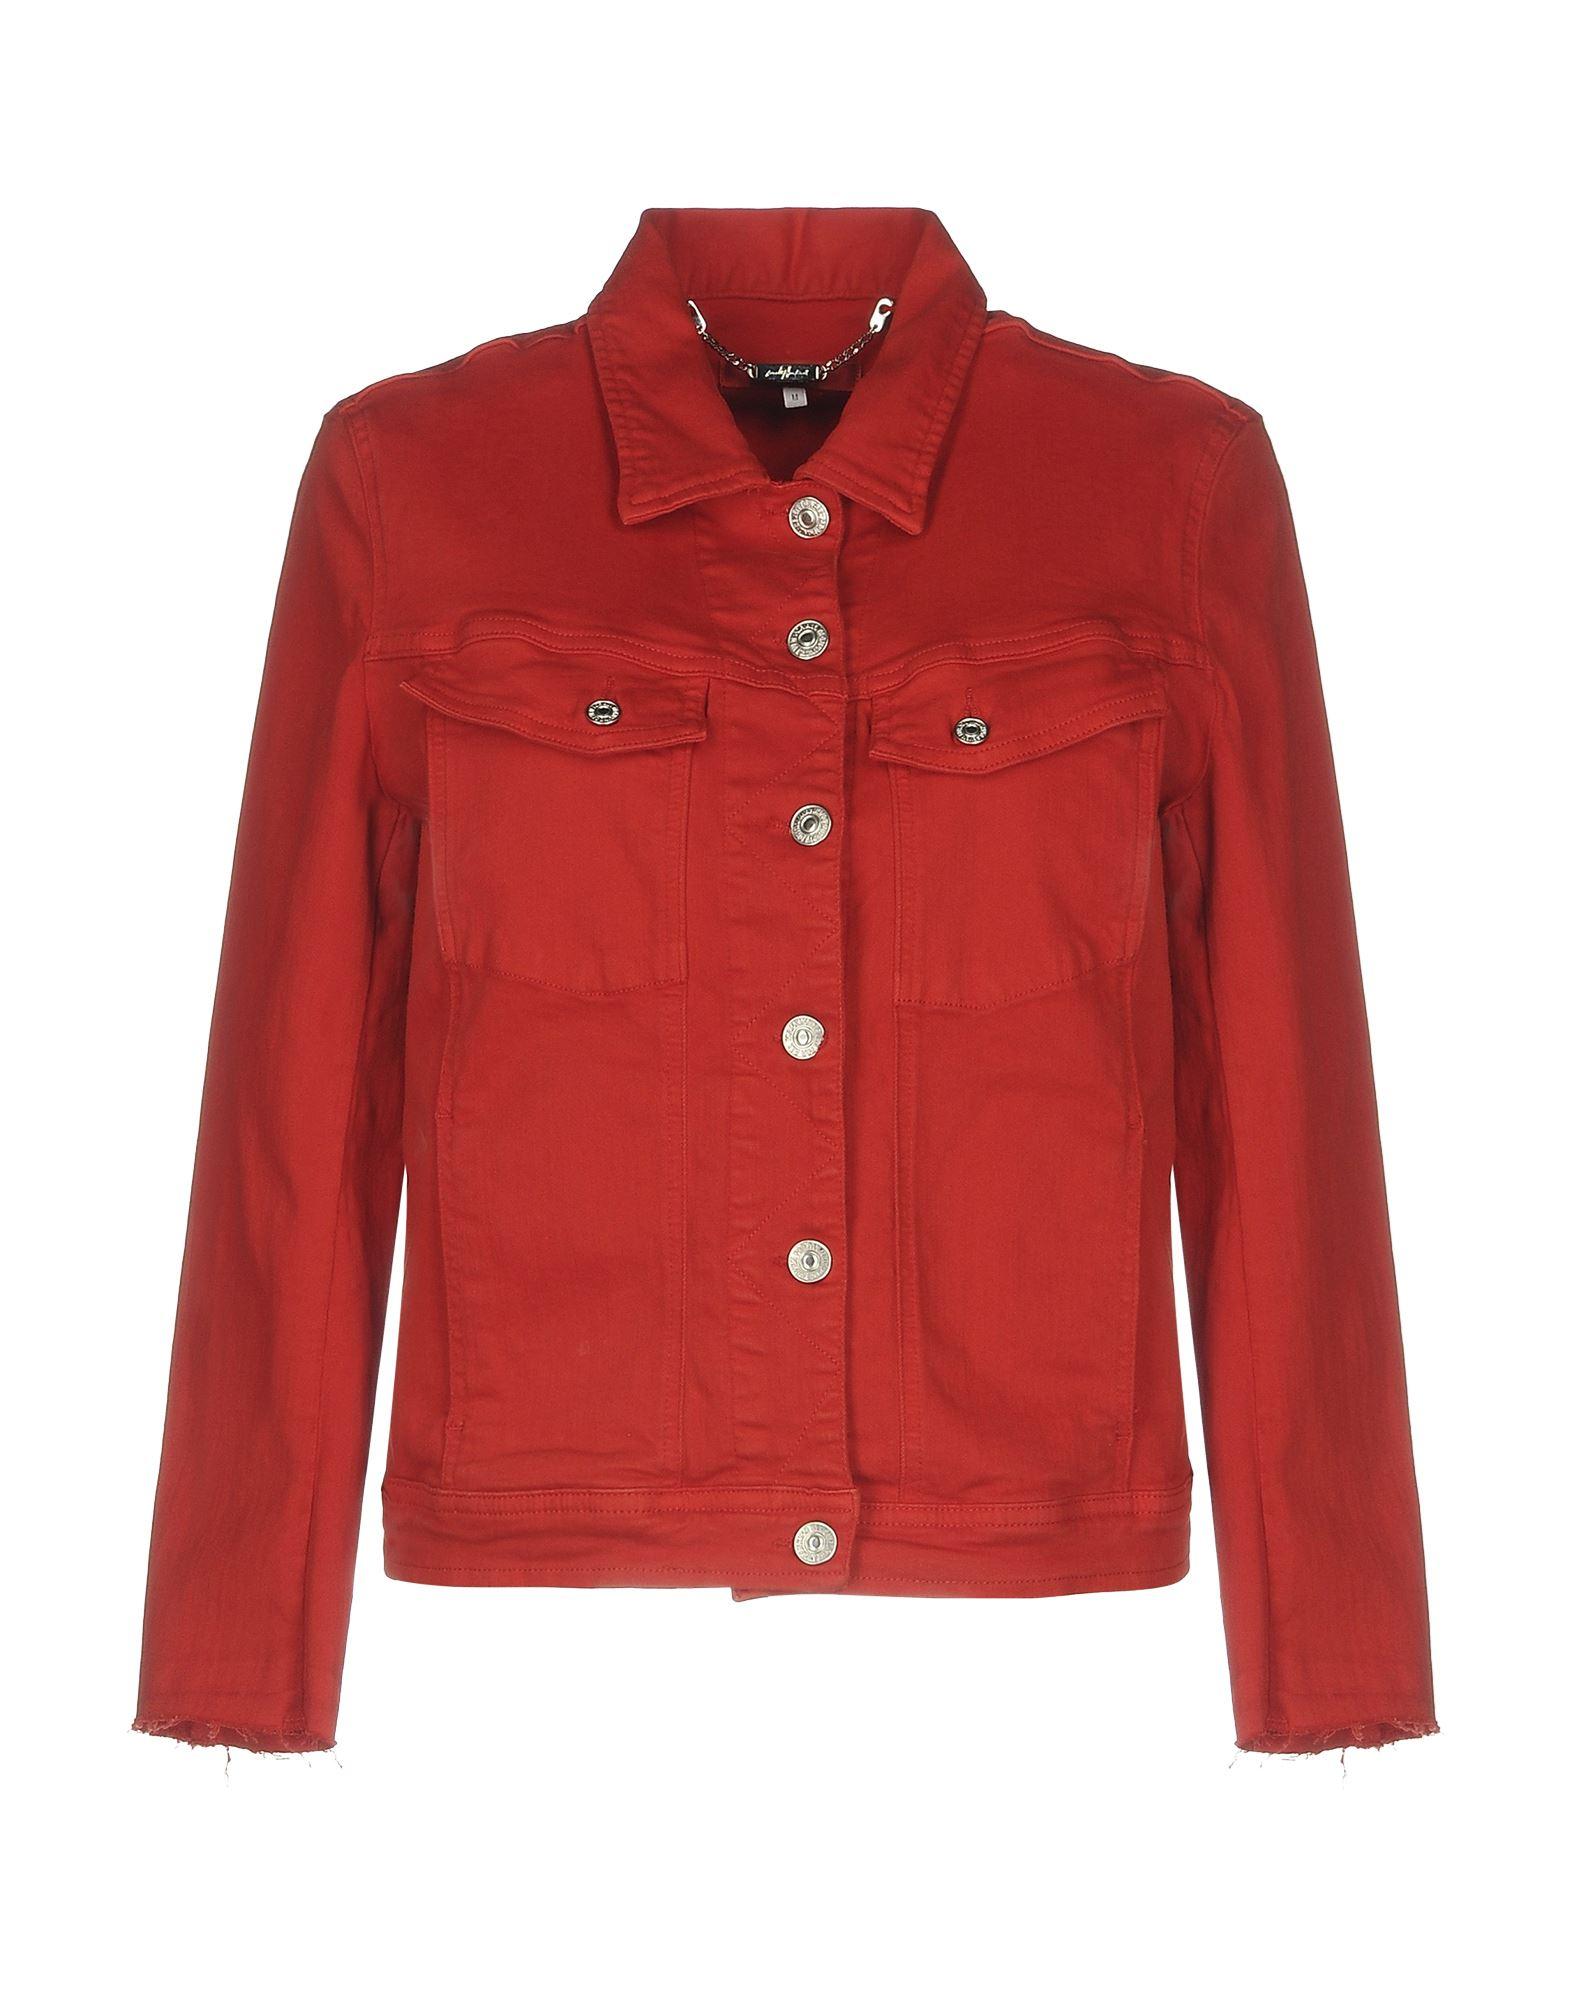 7 FOR ALL MANKIND Джинсовая верхняя одежда 26 7 twentysixseven джинсовая верхняя одежда